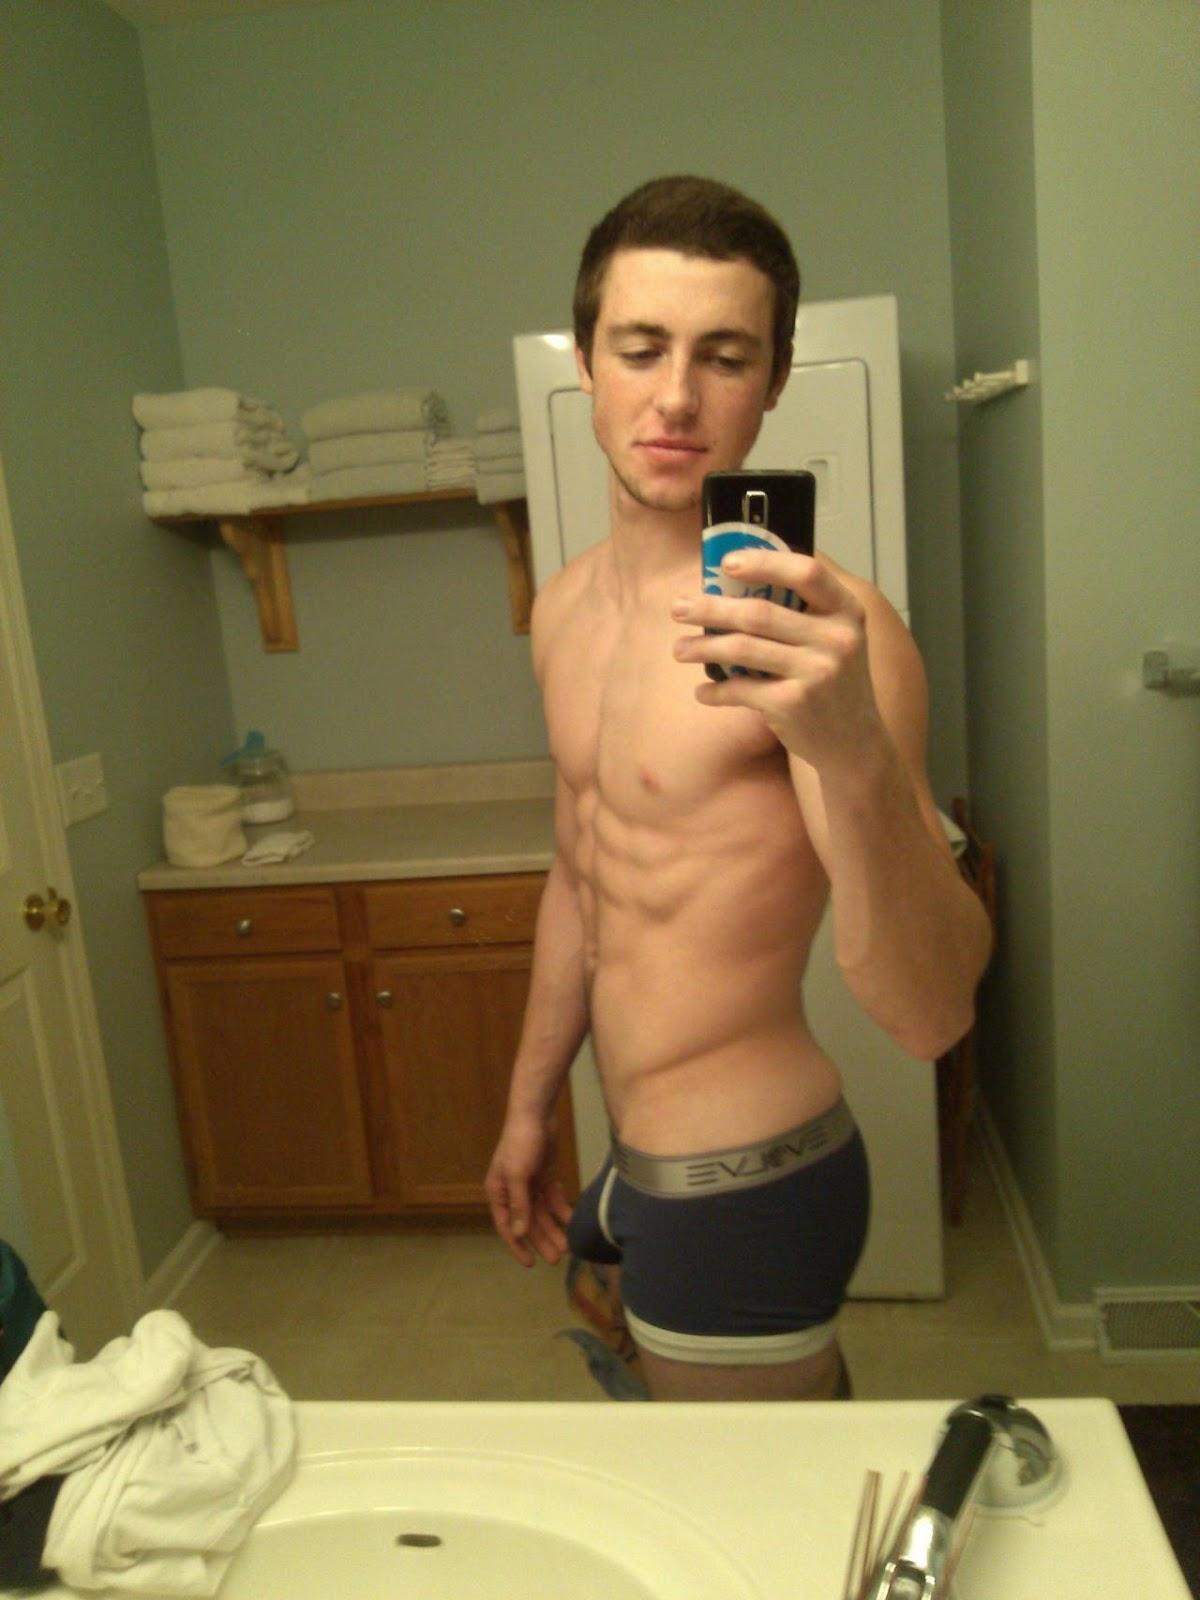 Naked Male Selfie Pics